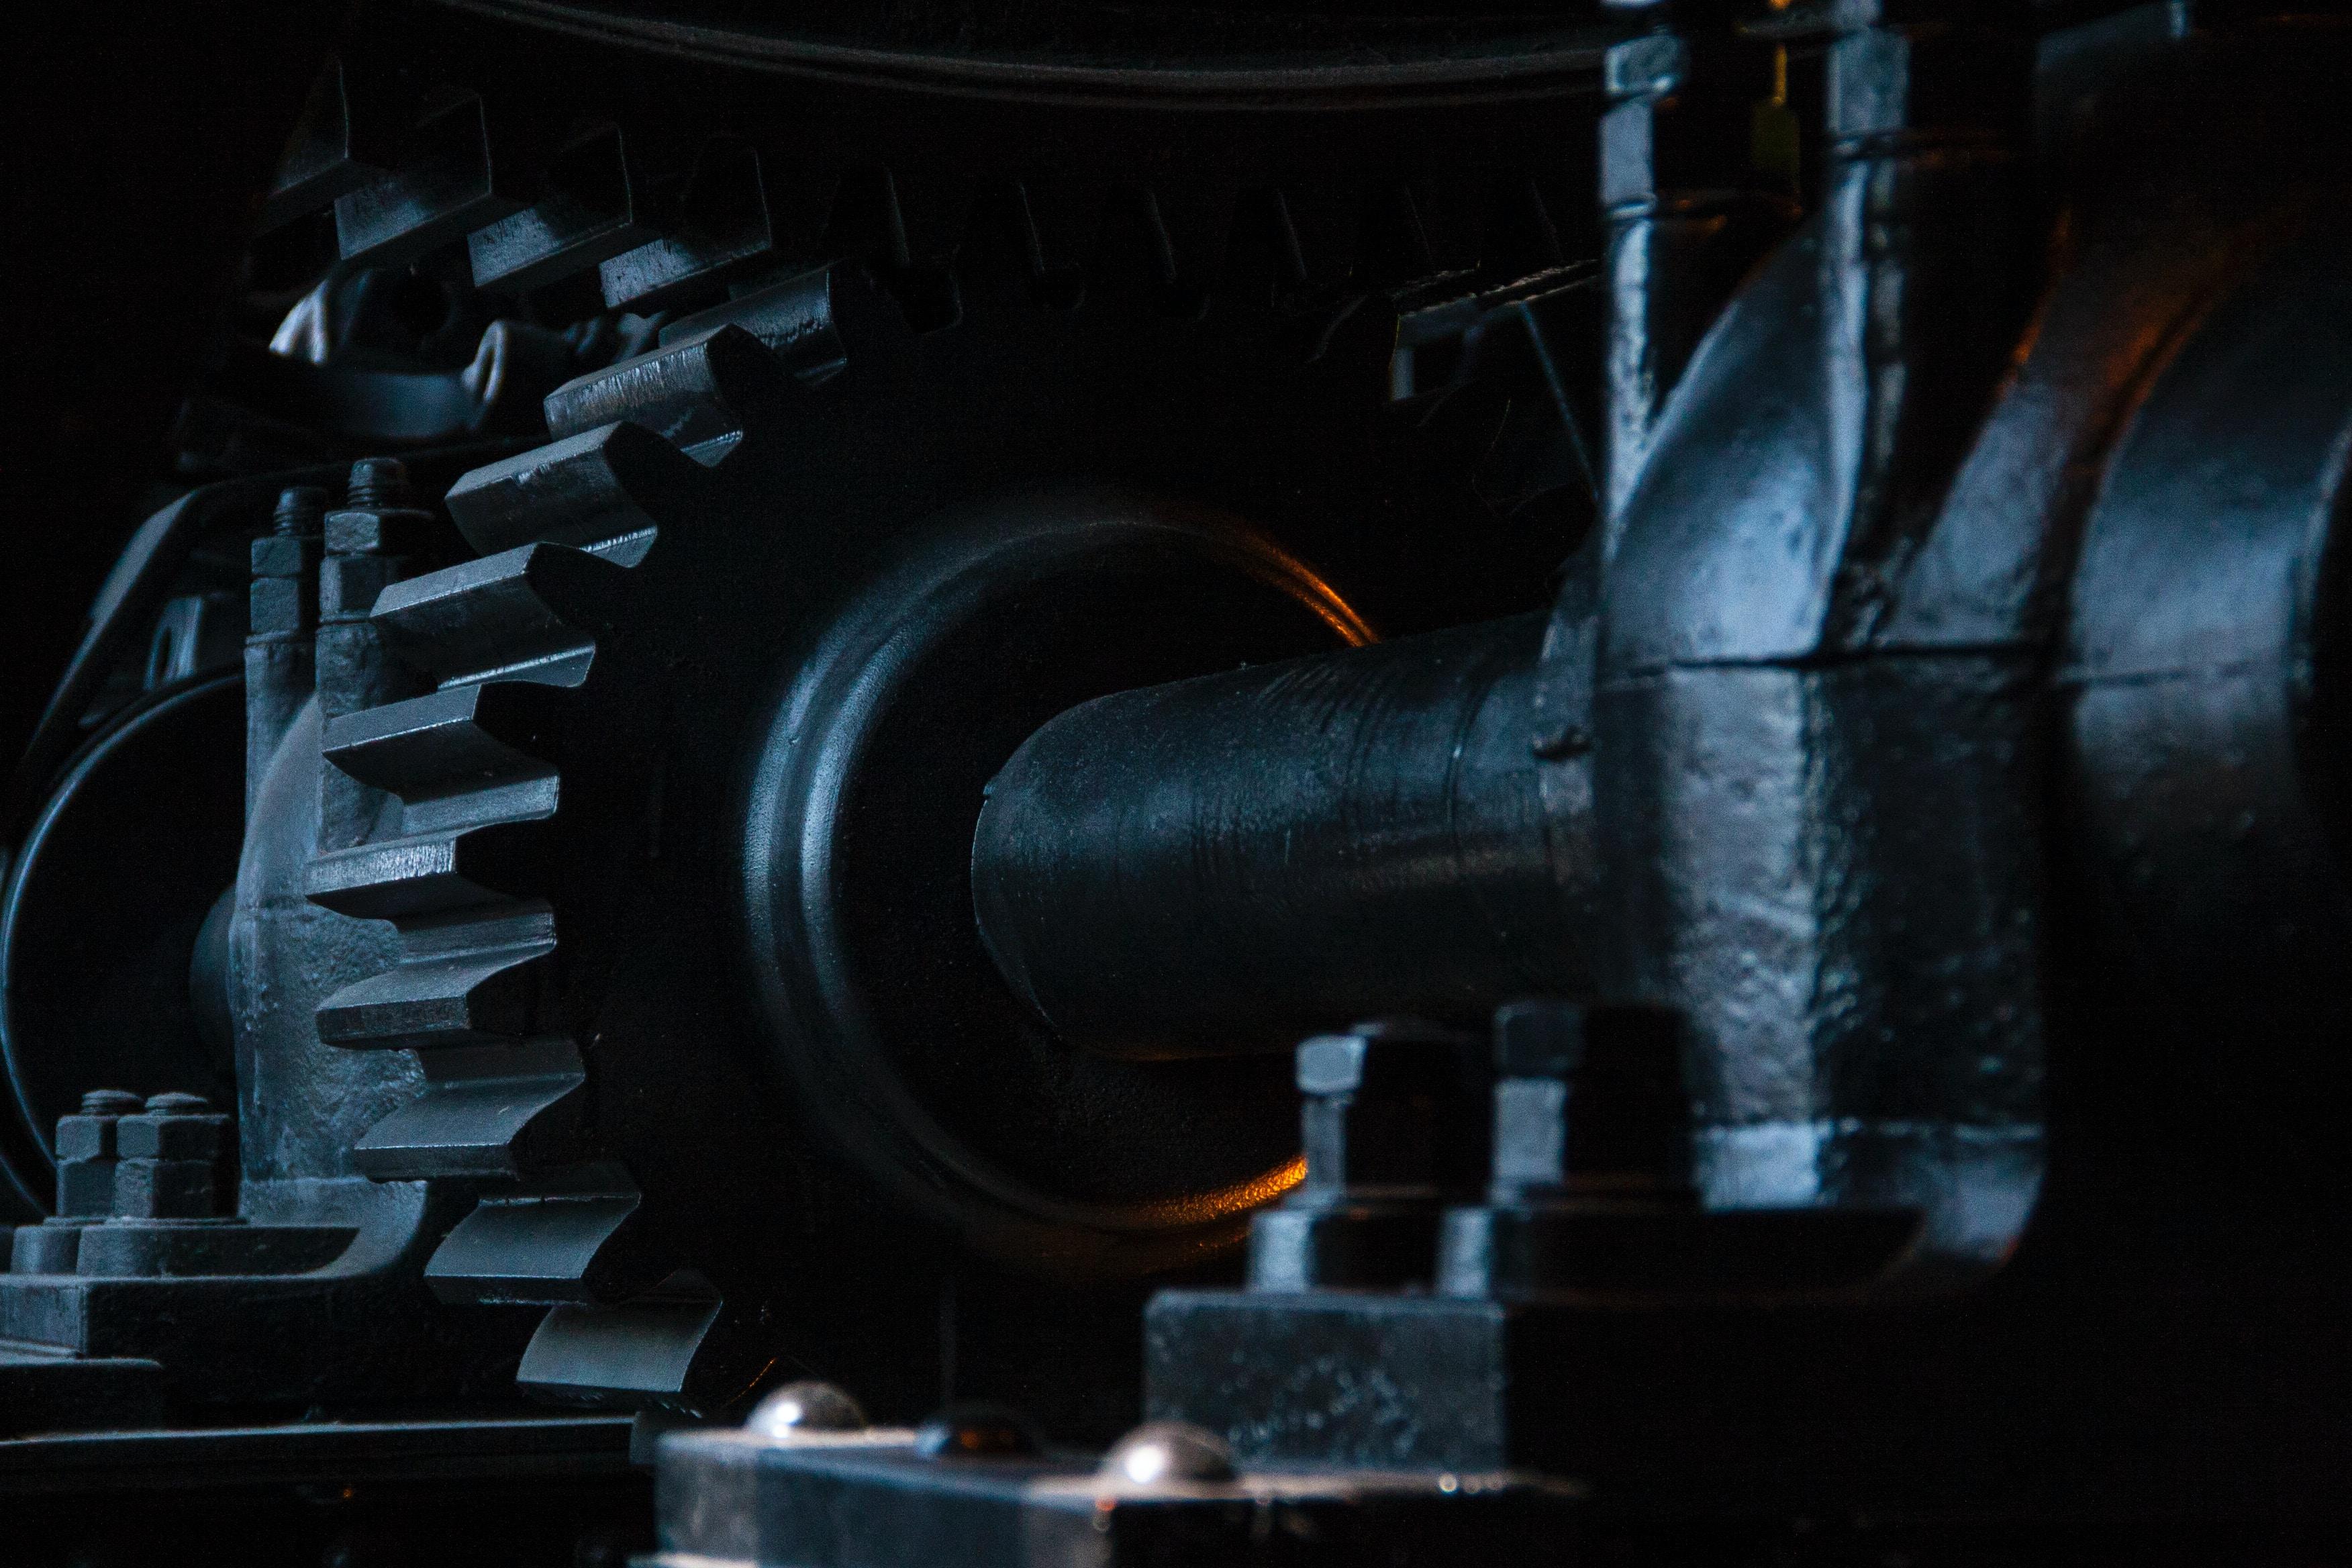 Machine drive gears